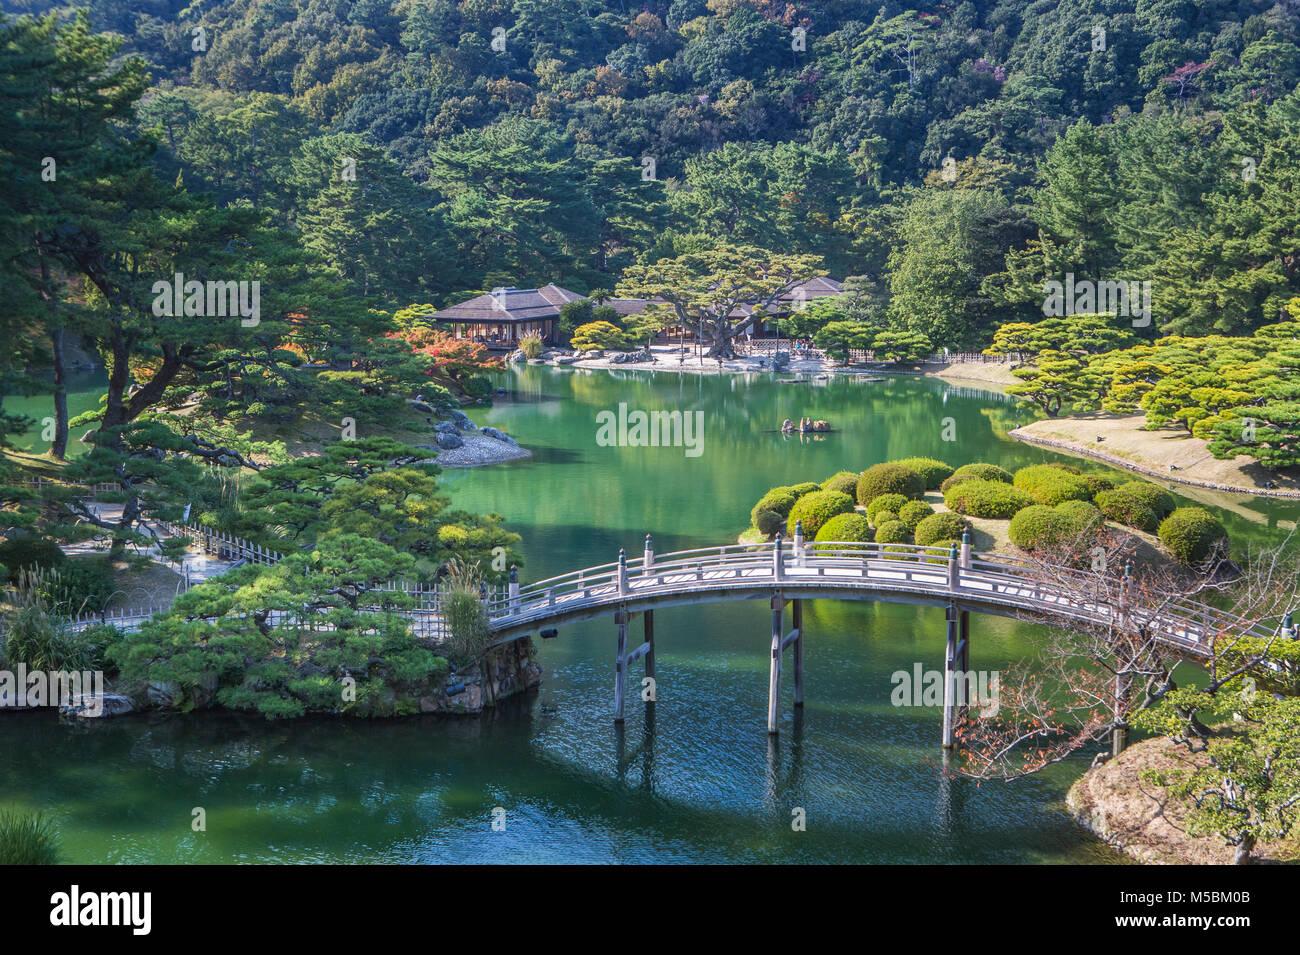 Le Japon, l'île de Shikoku, Ville de Takamatsu, Ritsurin Koen Jardin Photo Stock